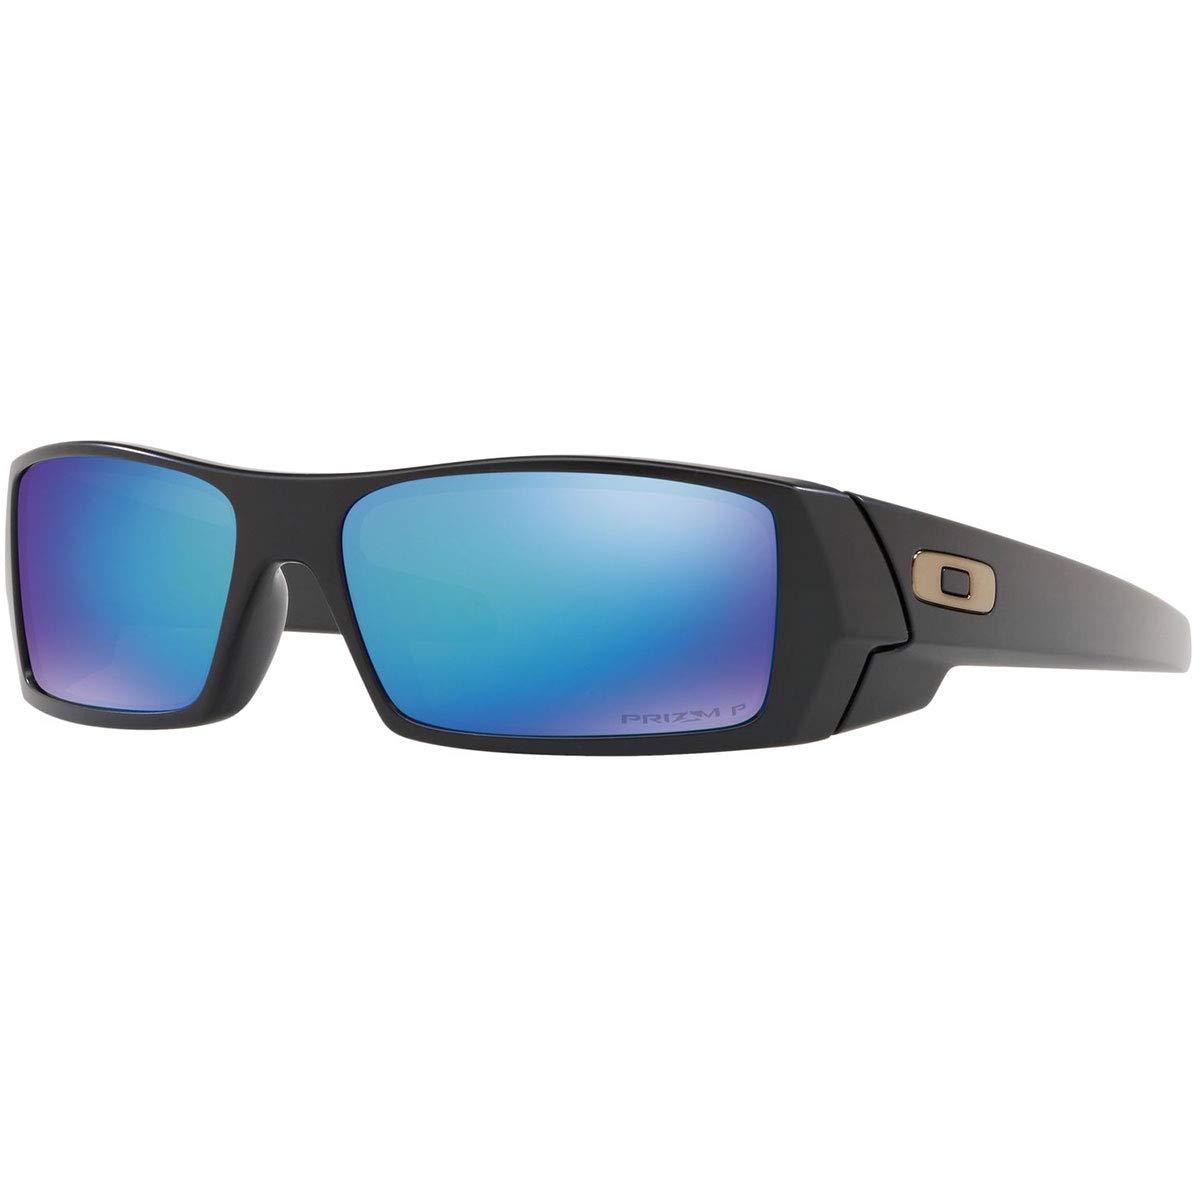 8b8cddcdb3 Amazon.com  Oakley Men s GASCAN Sunglasses